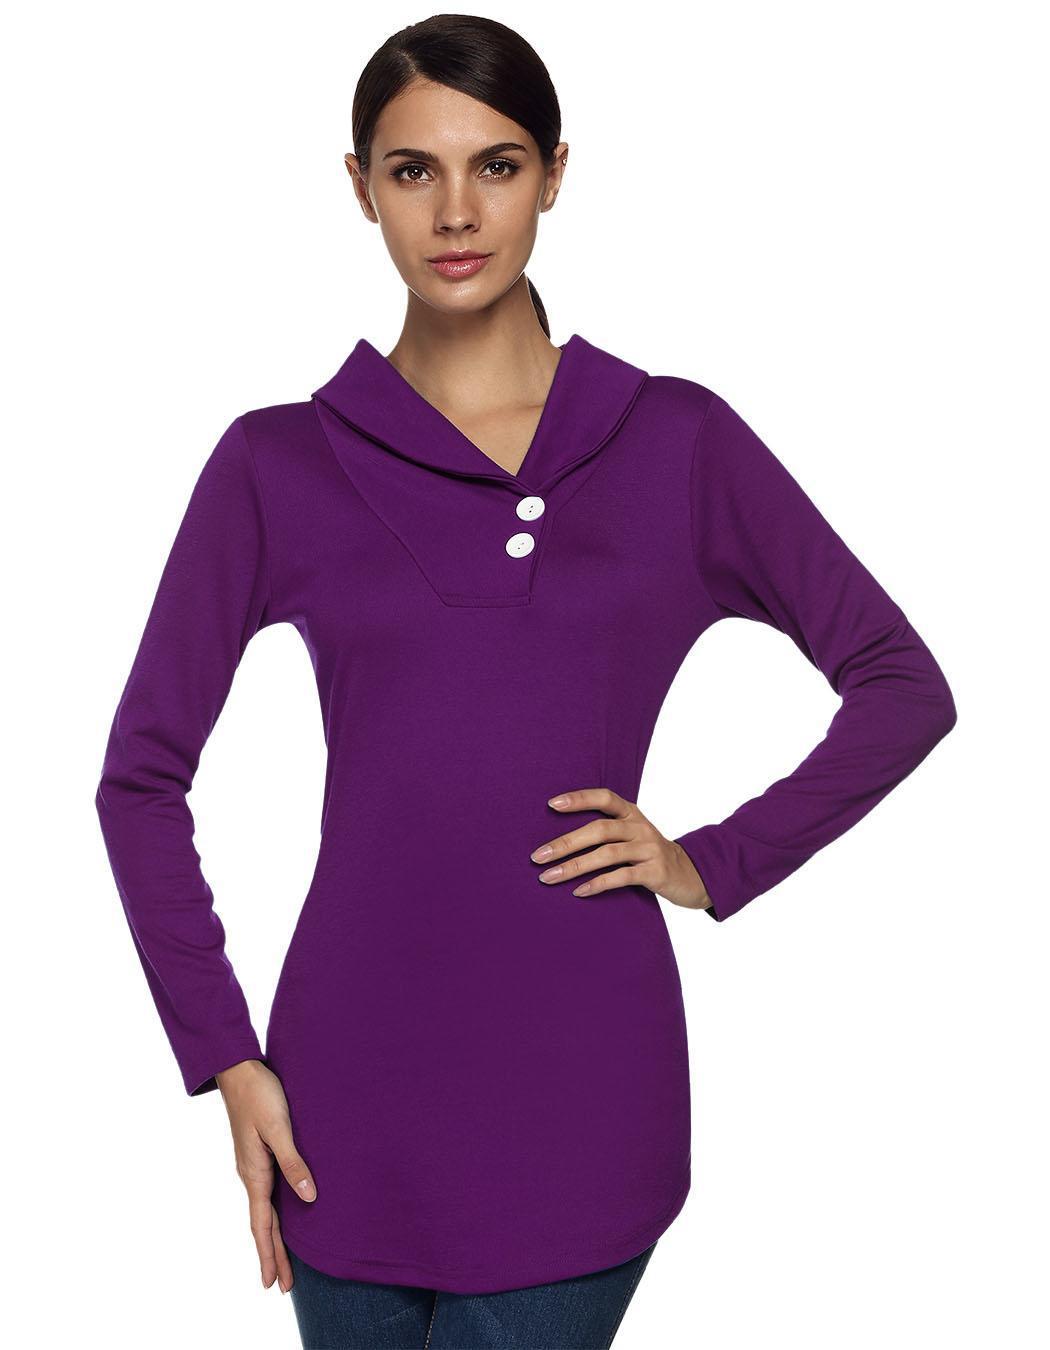 Women Shawl Collar Long Sleeve Solid Tunic Outwear Tops Blouse Coat 2